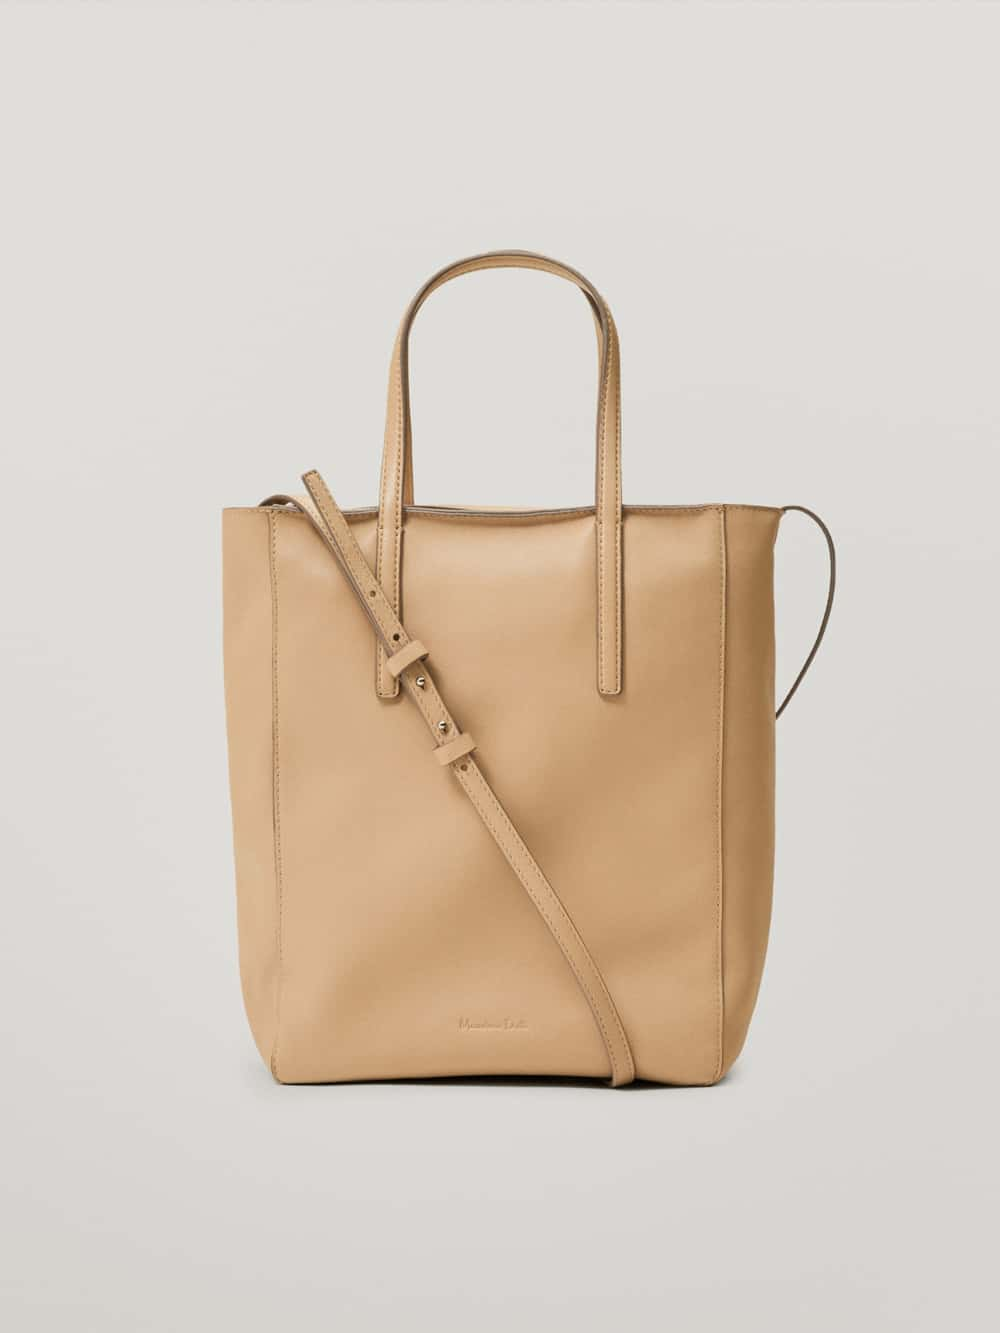 Massimo Dutti kožne torbe sniženje 2021. 1